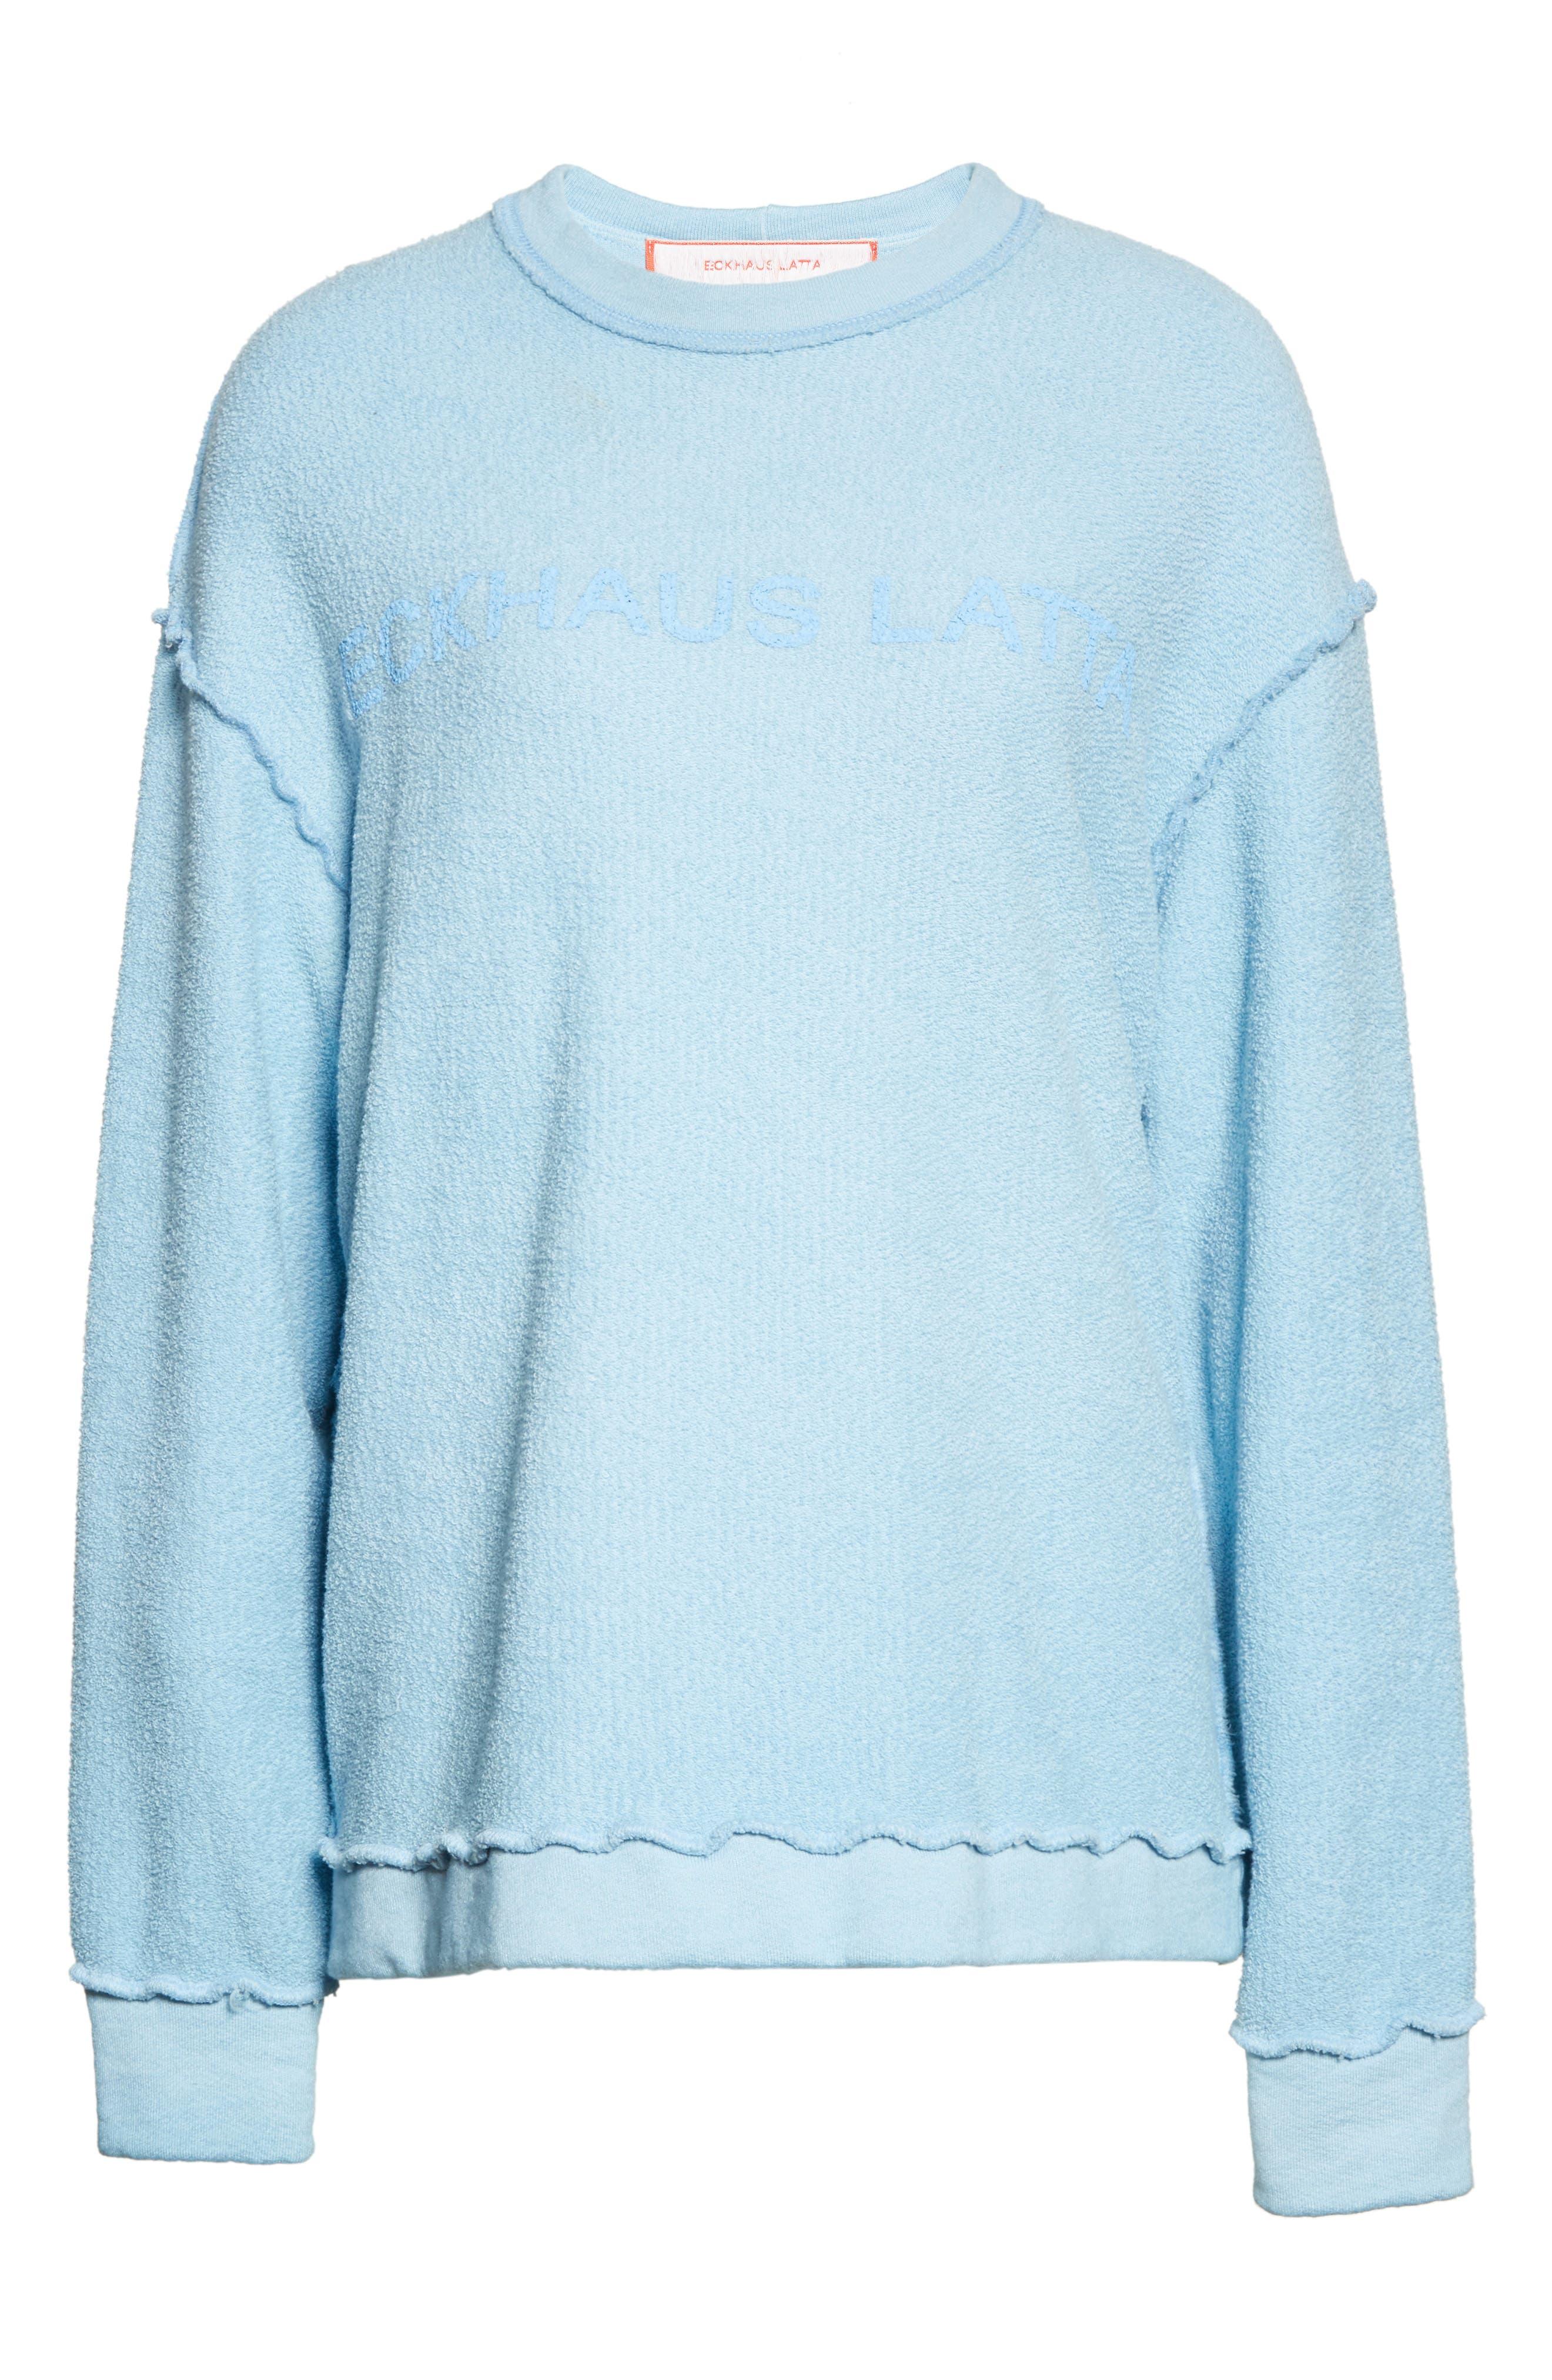 Alternate Image 4  - Eckhaus Latta Drop Shoulder Reverse Terry Sweatshirt